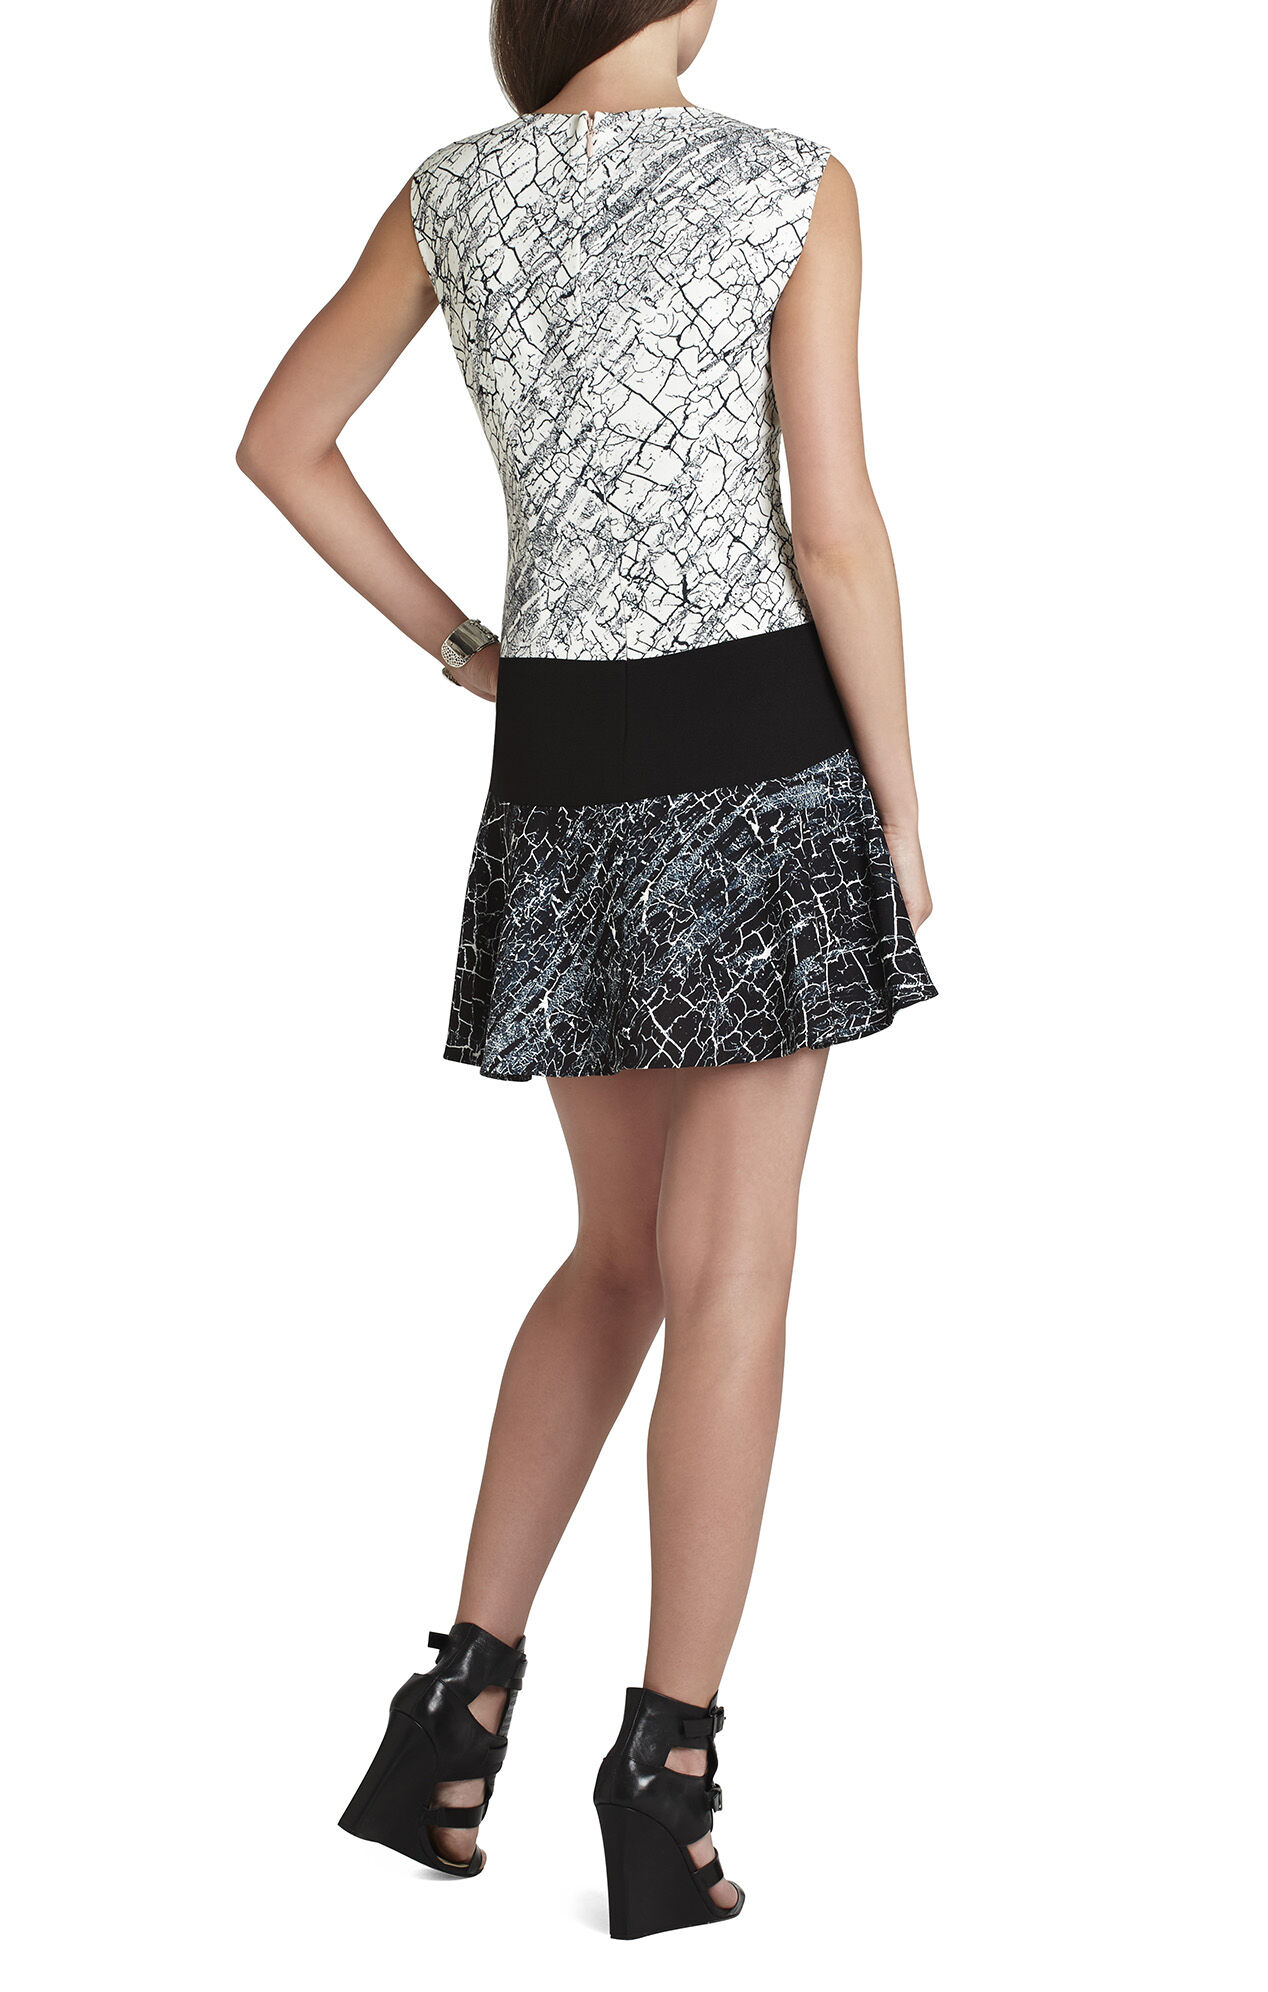 Lillian Sleeveless Blocked Dress